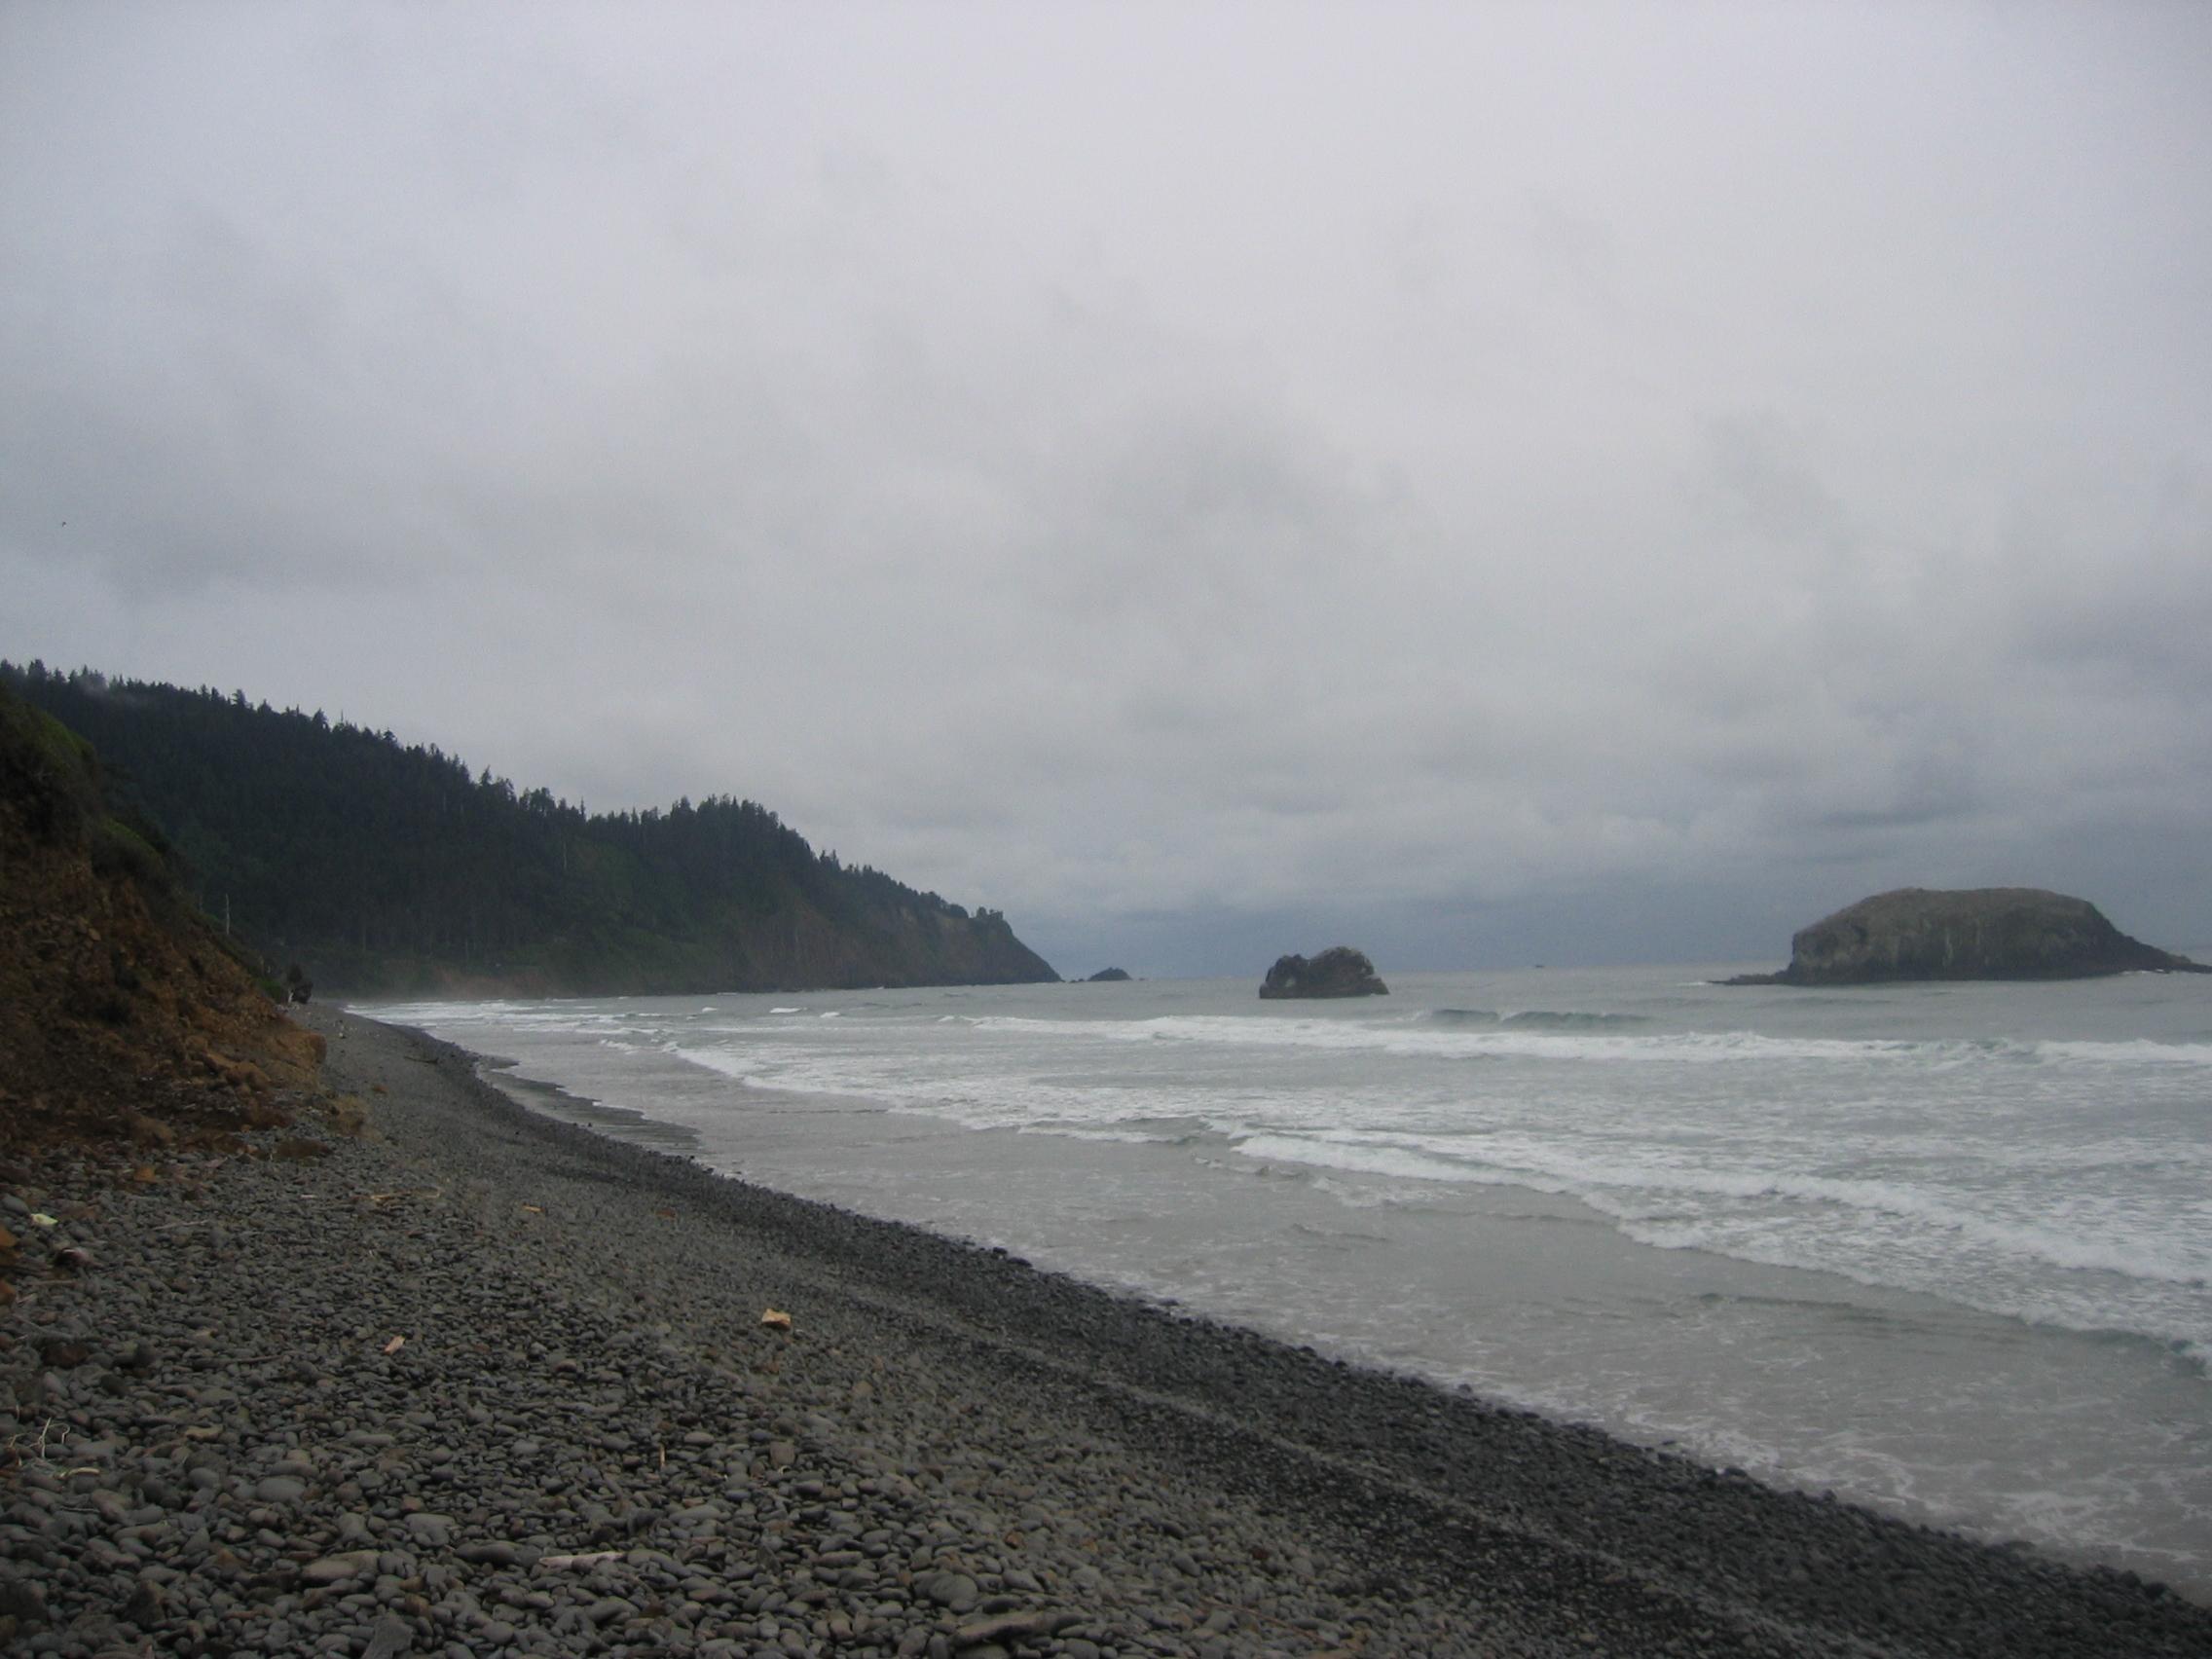 File:cove Beach Shoreline.jpg